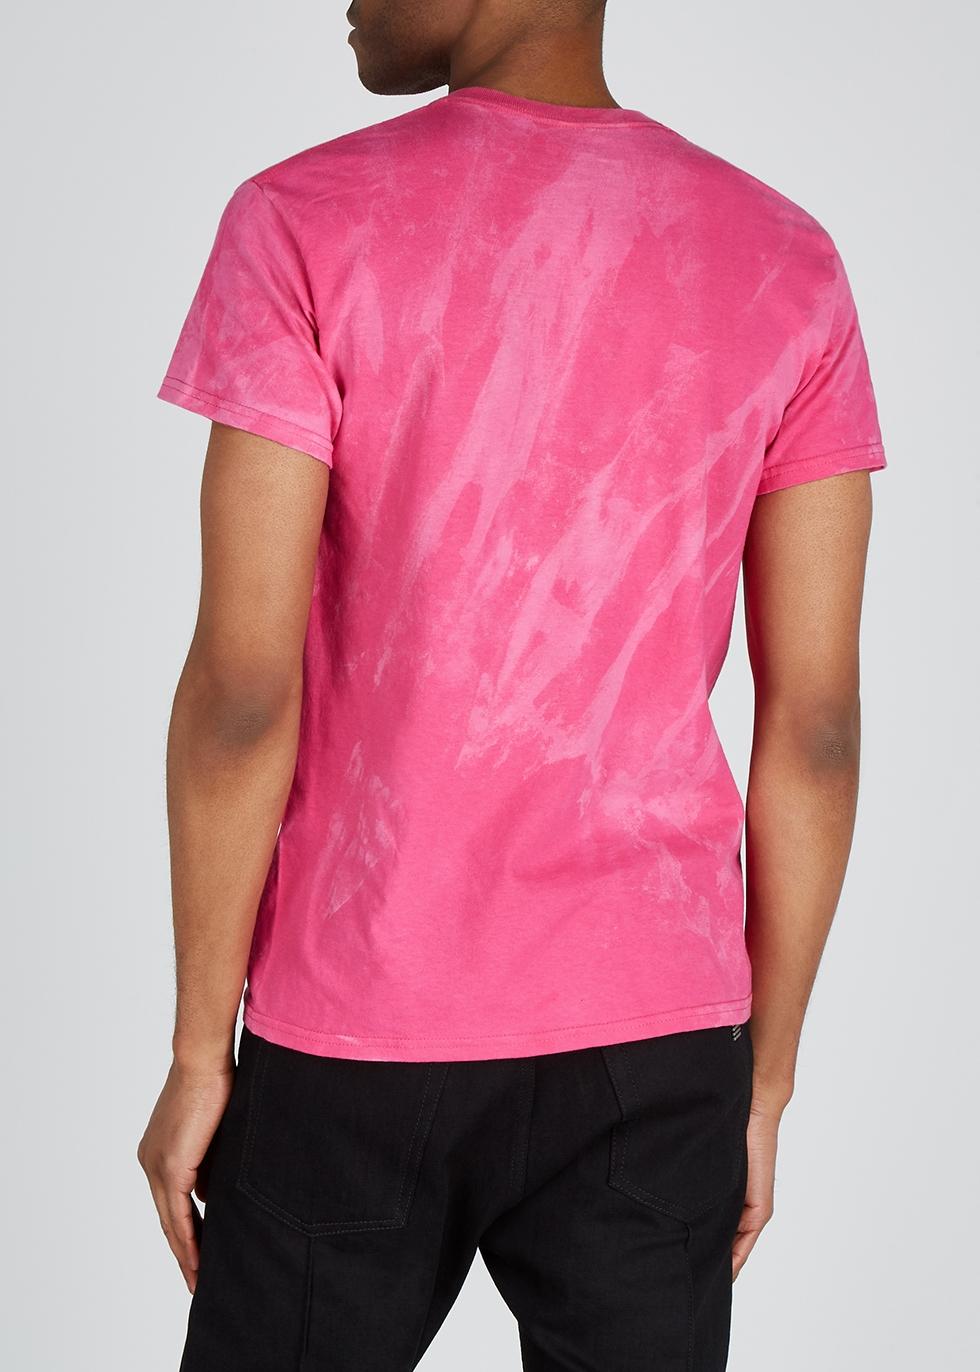 Pink printed cotton T-shirt - Darkoveli